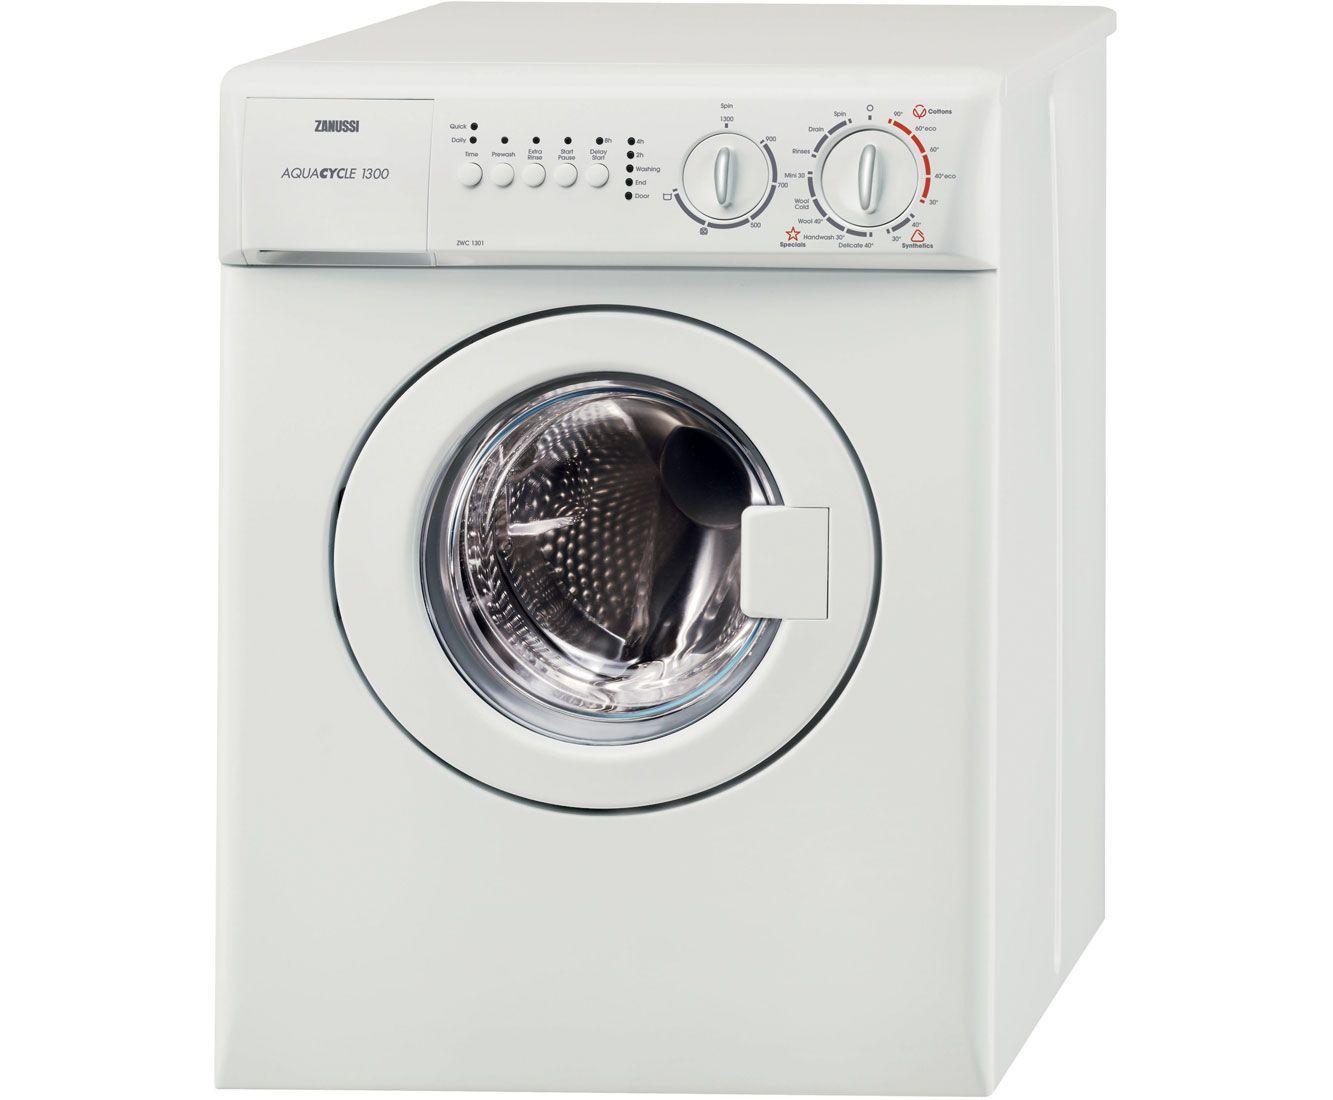 Things To Keep In Mind While Buying Washing Machine